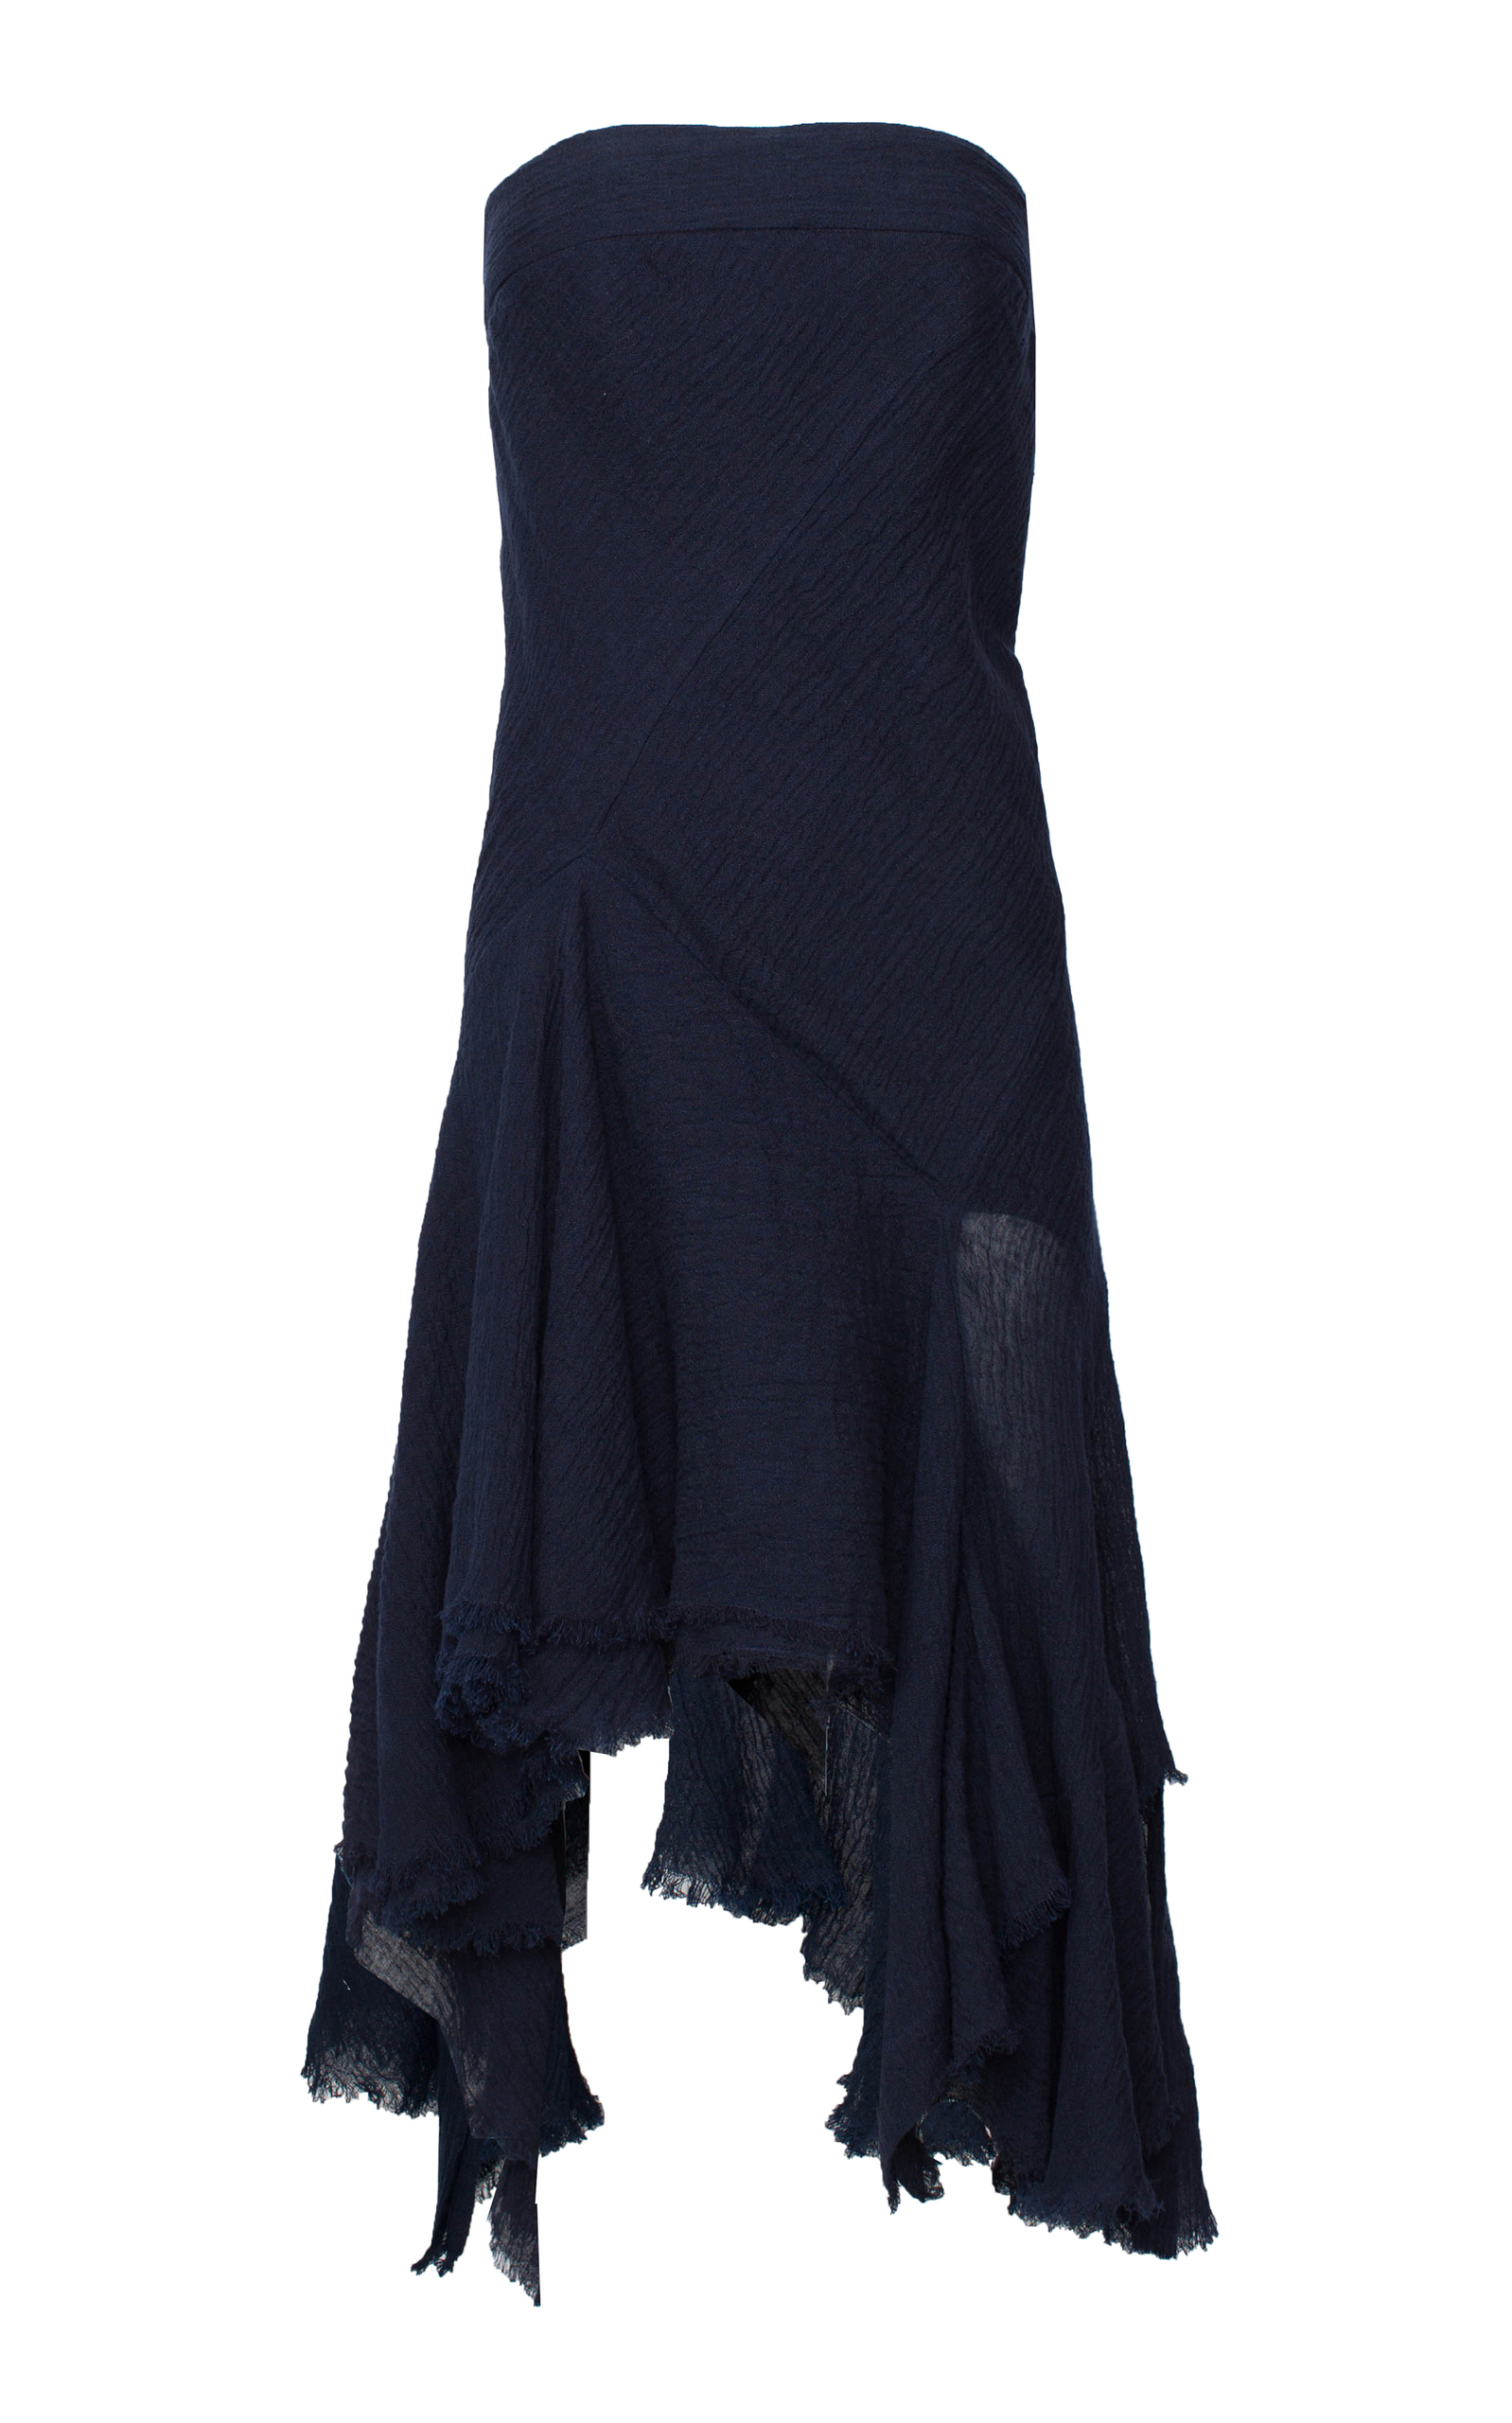 Faithful Keeper Strapless Dress by Kitx